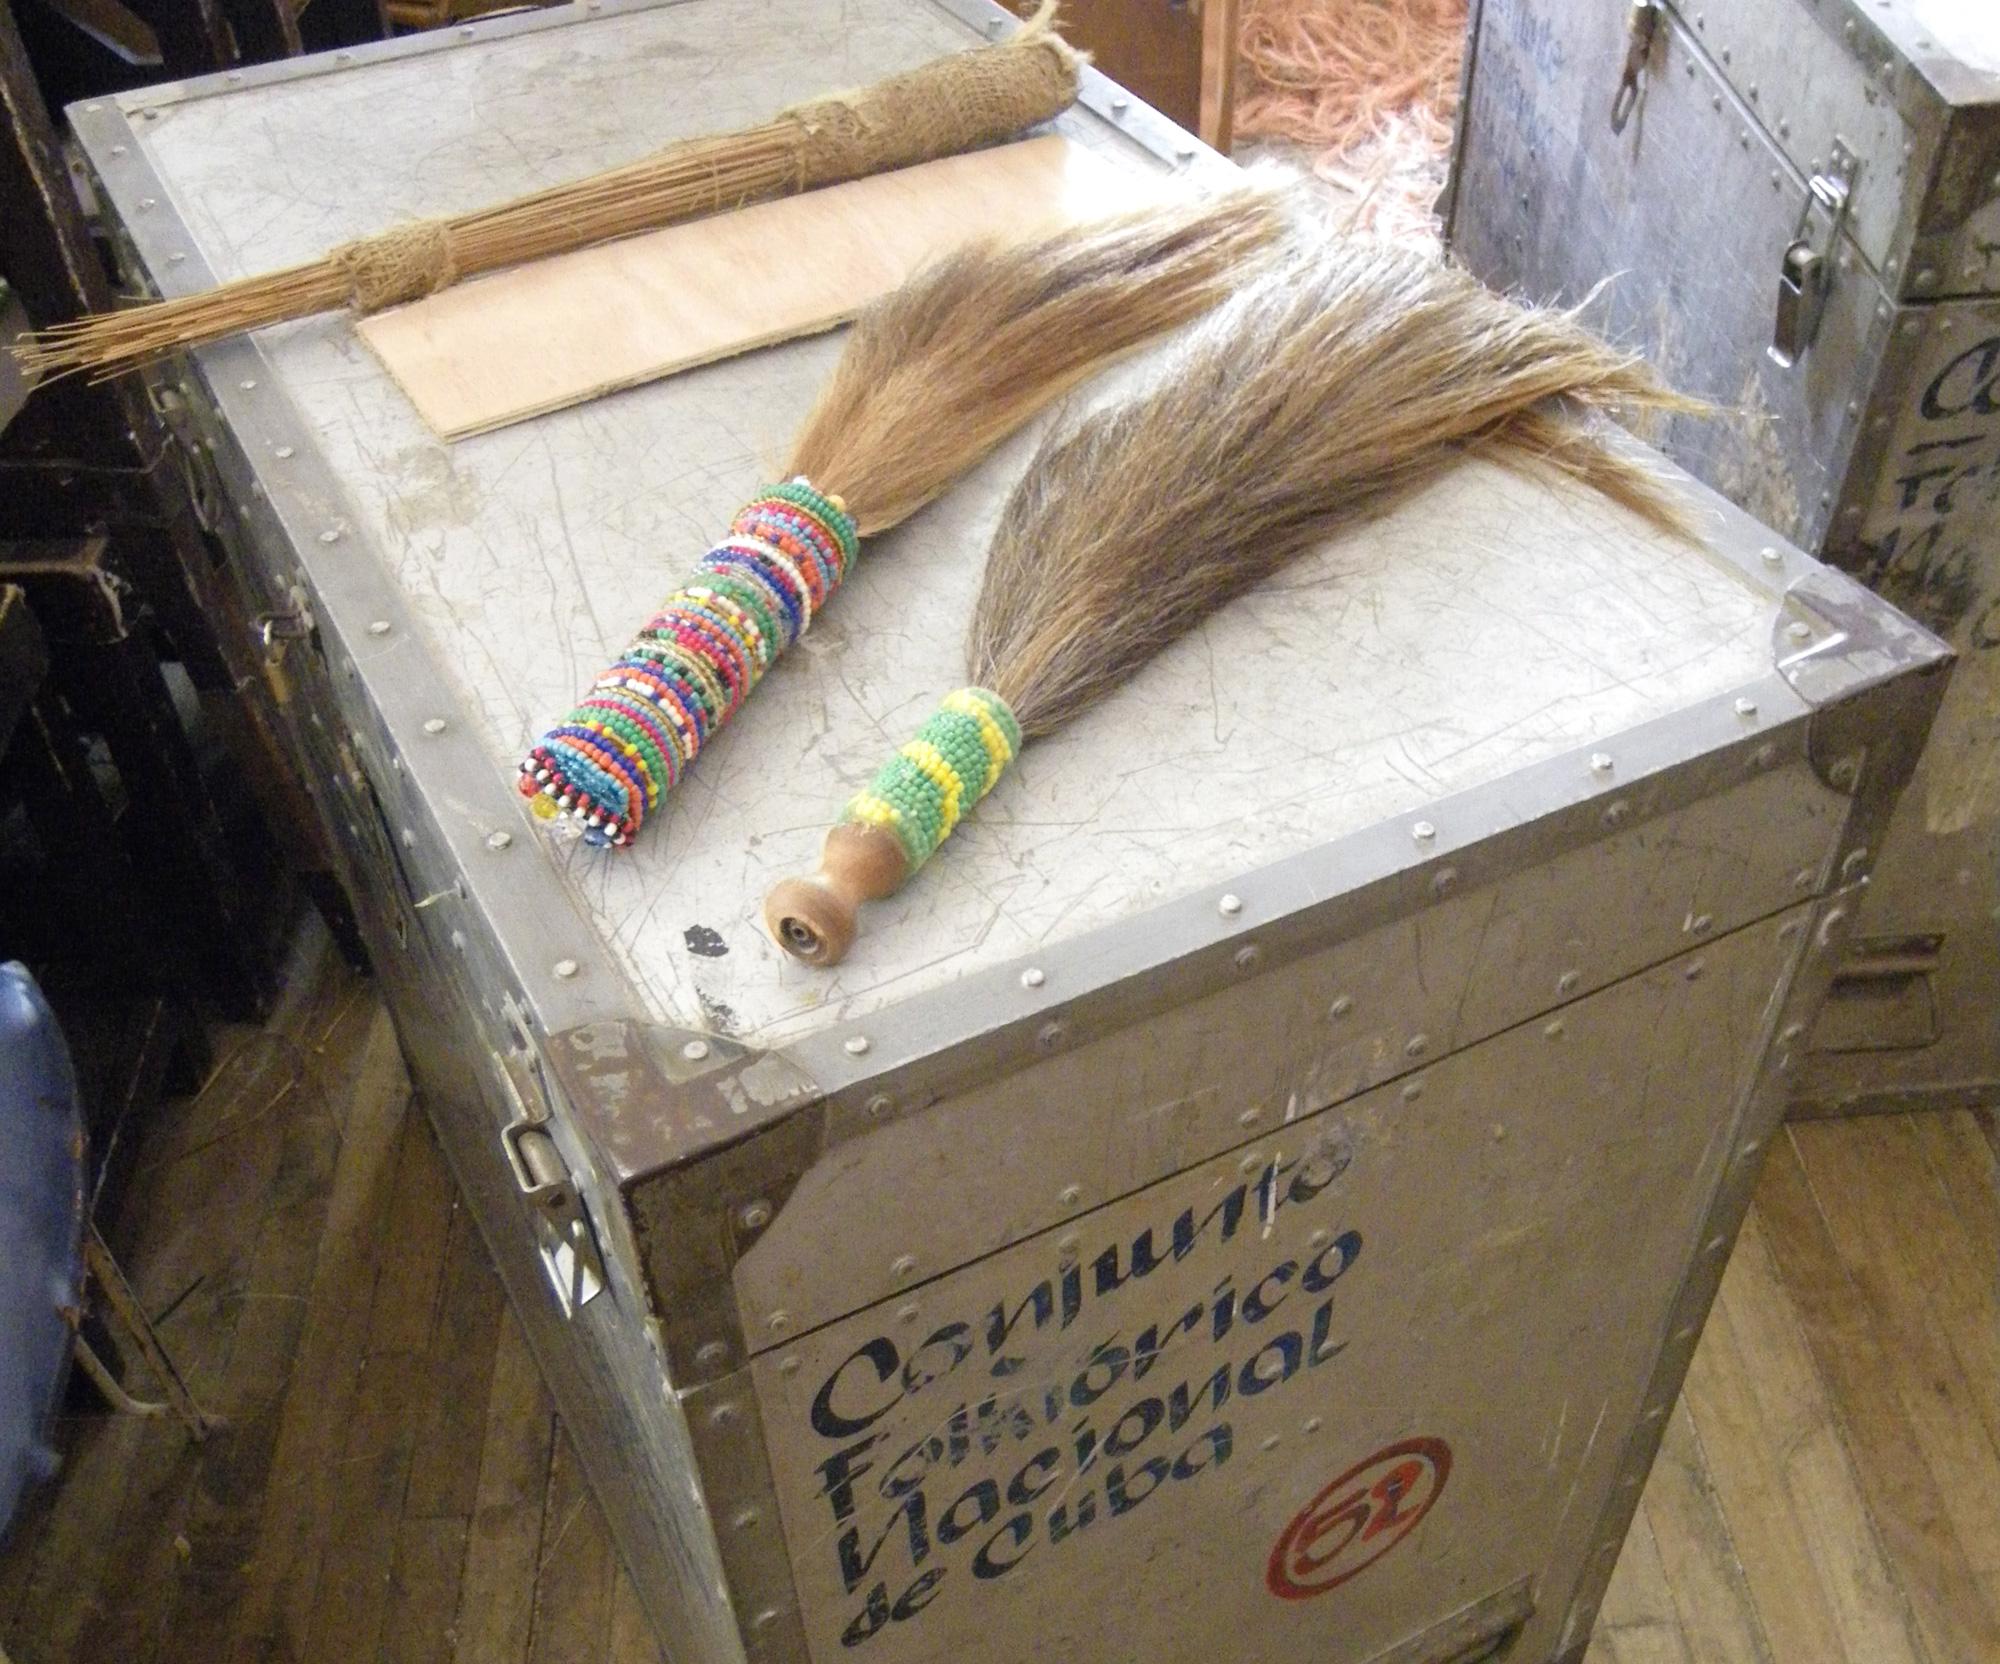 Babaluaye's broom and two iruke at the Conjunto Folklórico Nacional de Cuba in Havana. ©orishaimage.com